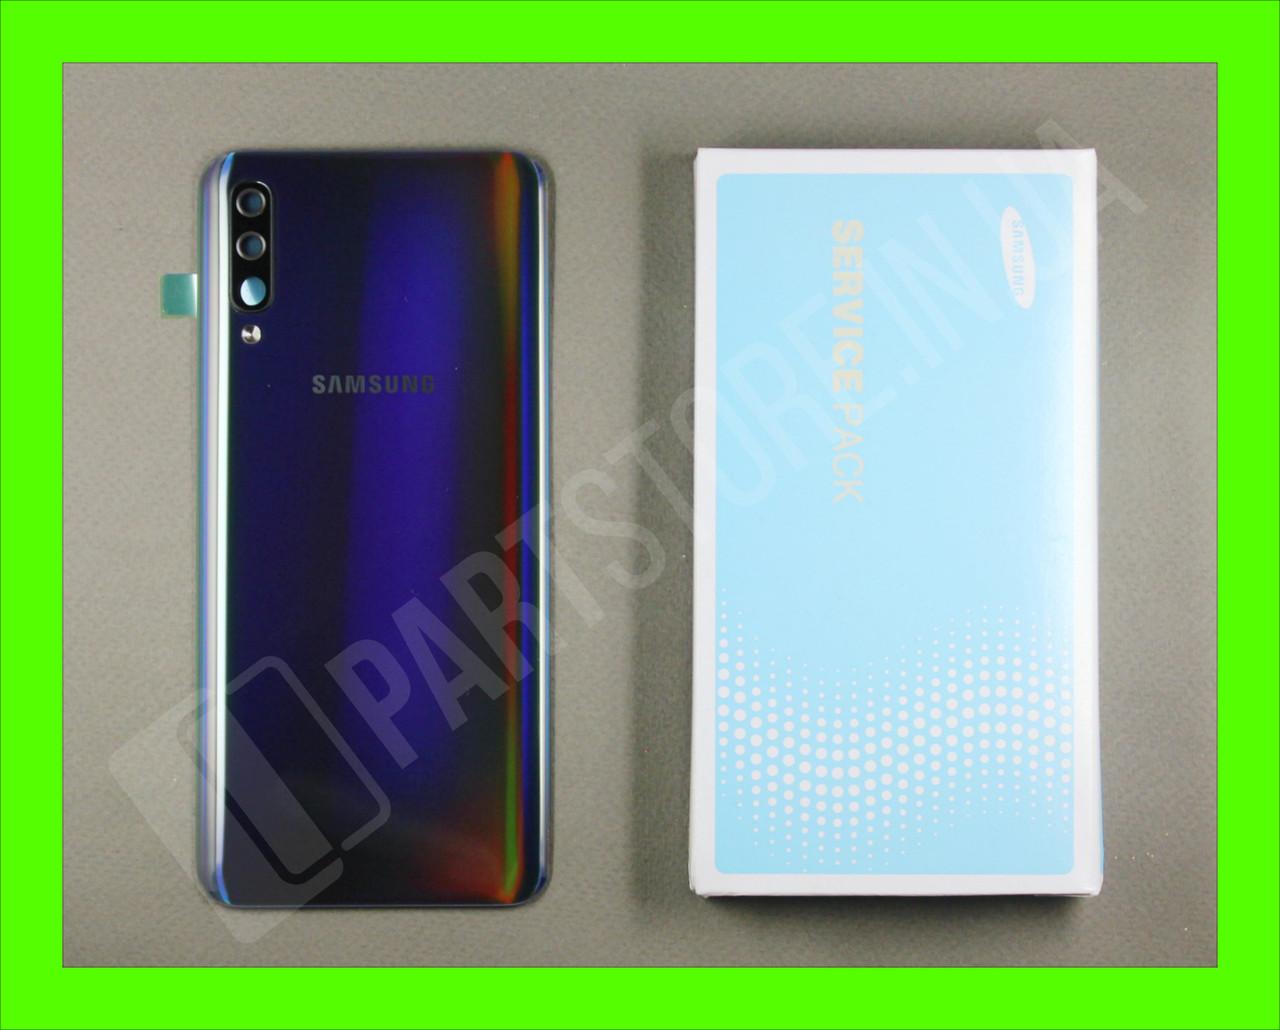 Cервисная оригинальная задняя Крышка Samsung A505 Black A50 2019 (GH82-19397A)